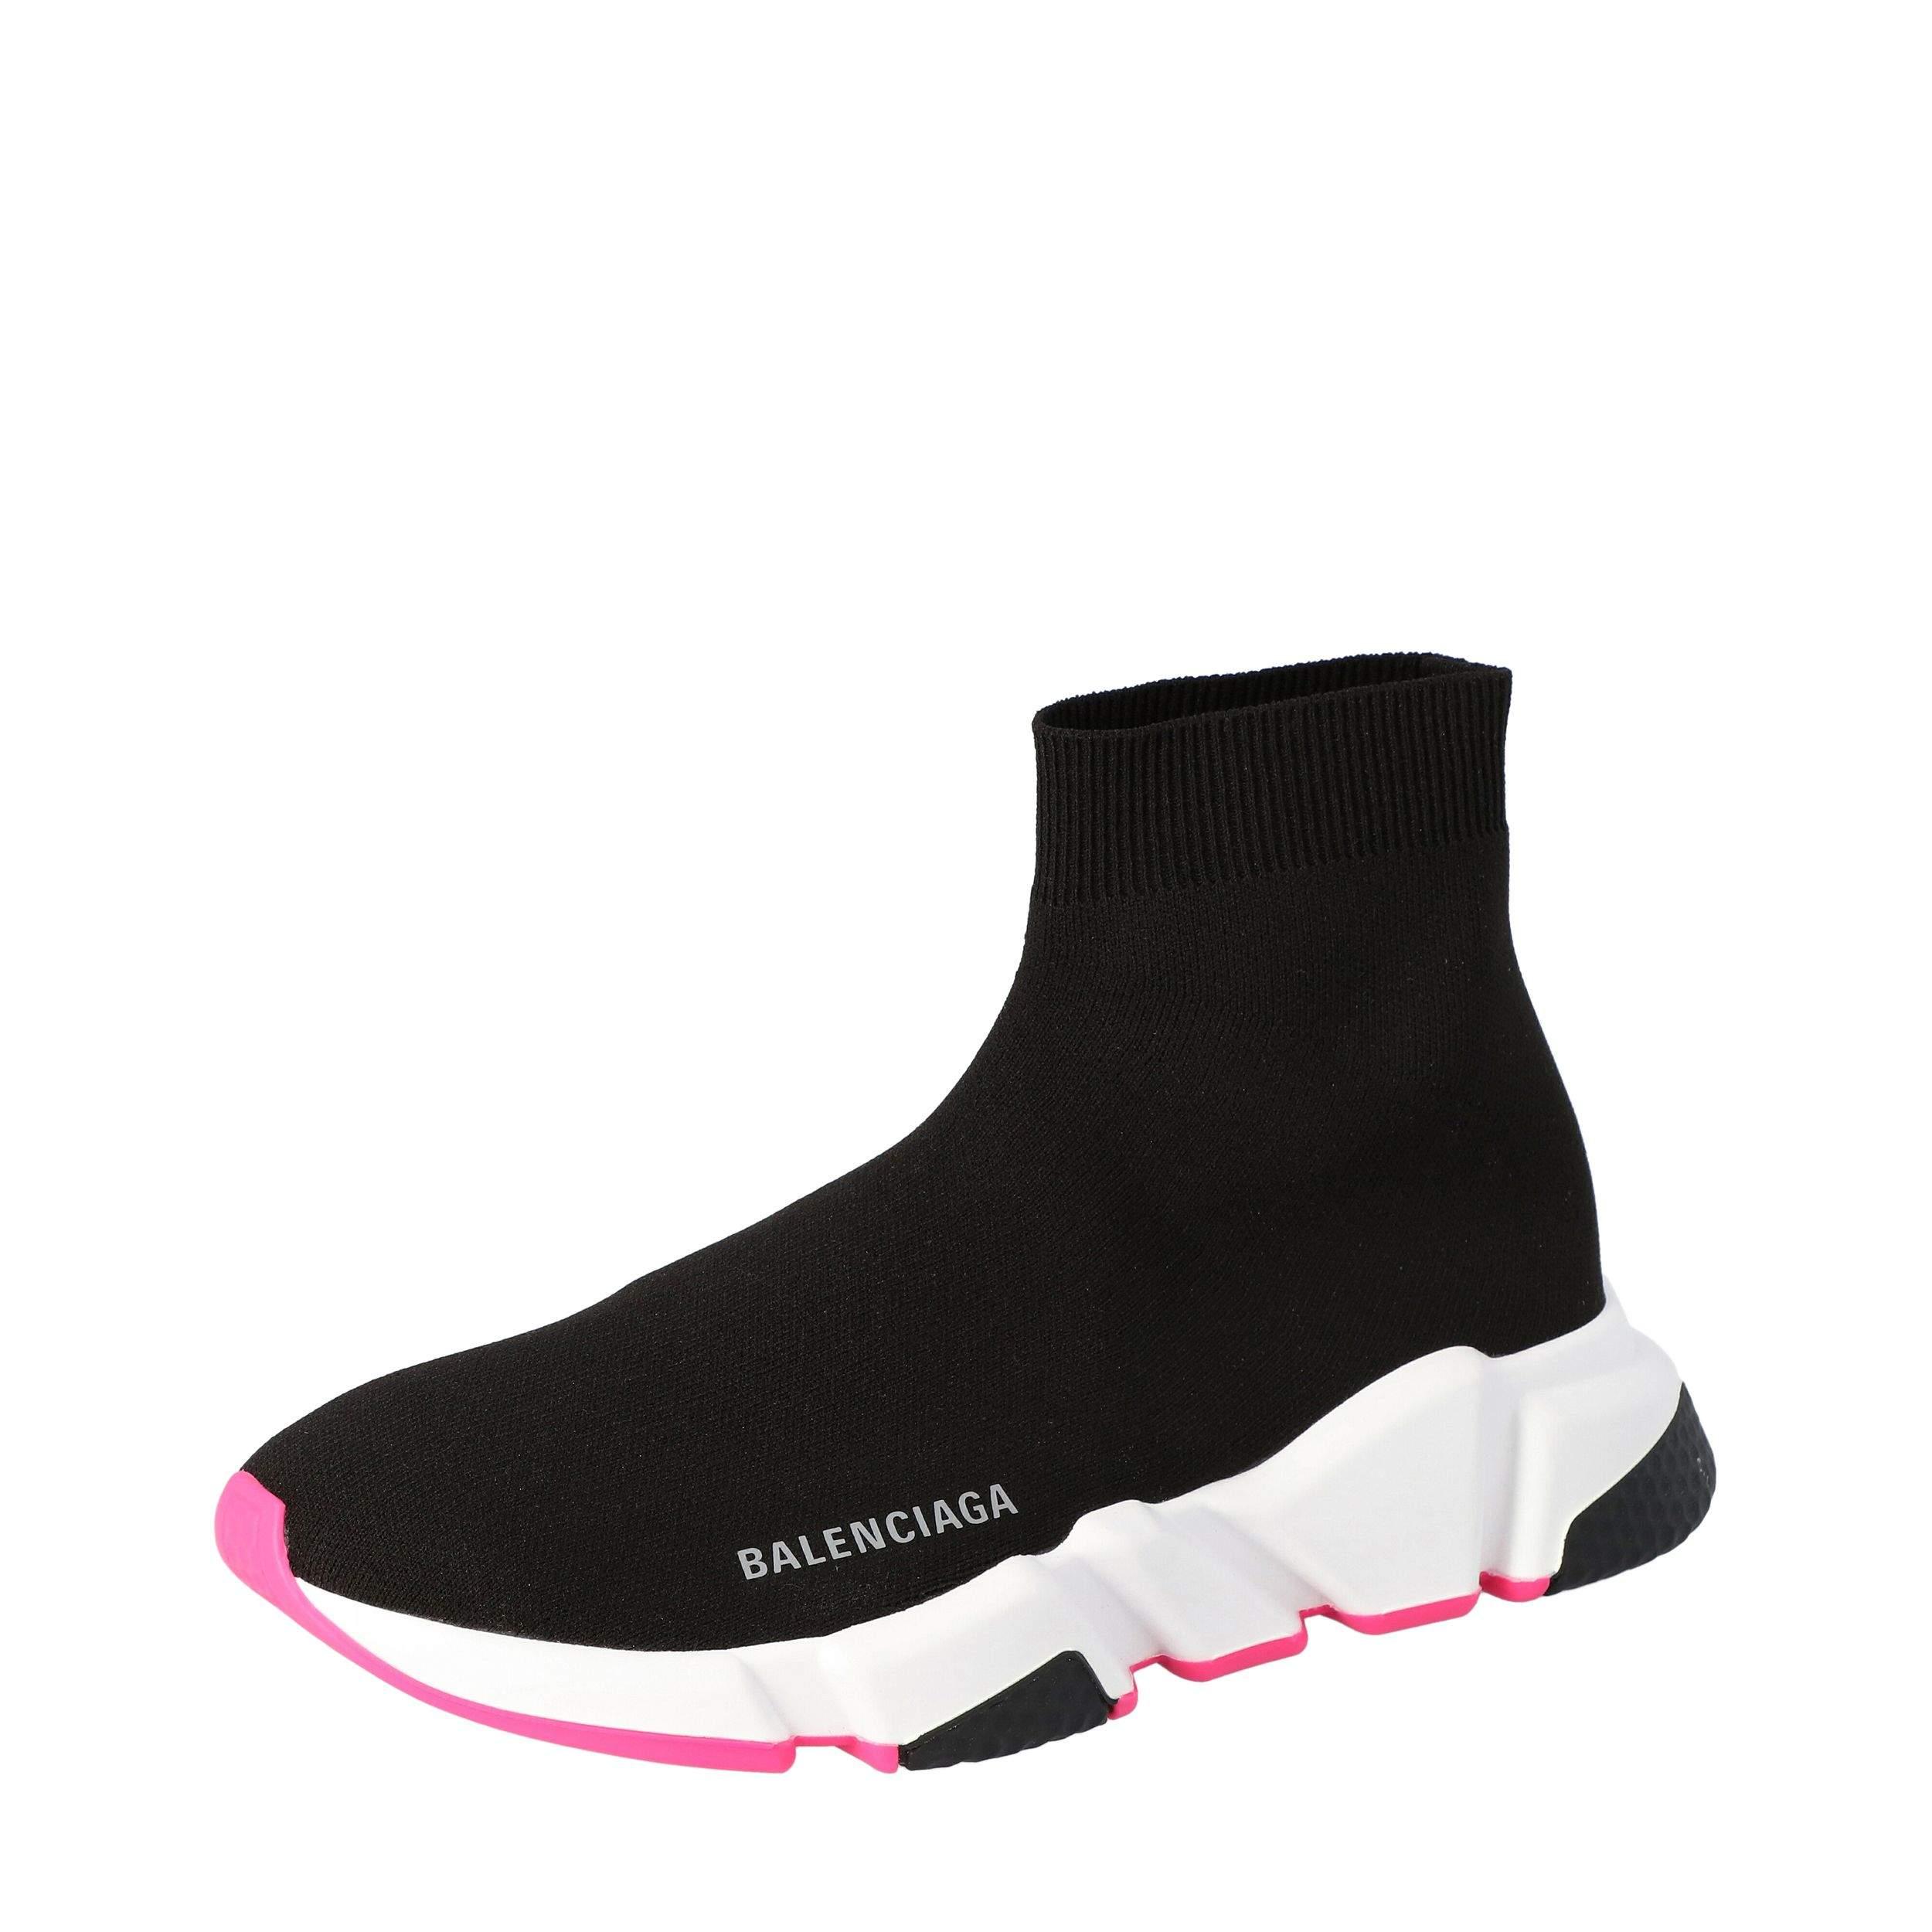 Balenciaga Black/White/Pink Speed Trainers Size 40